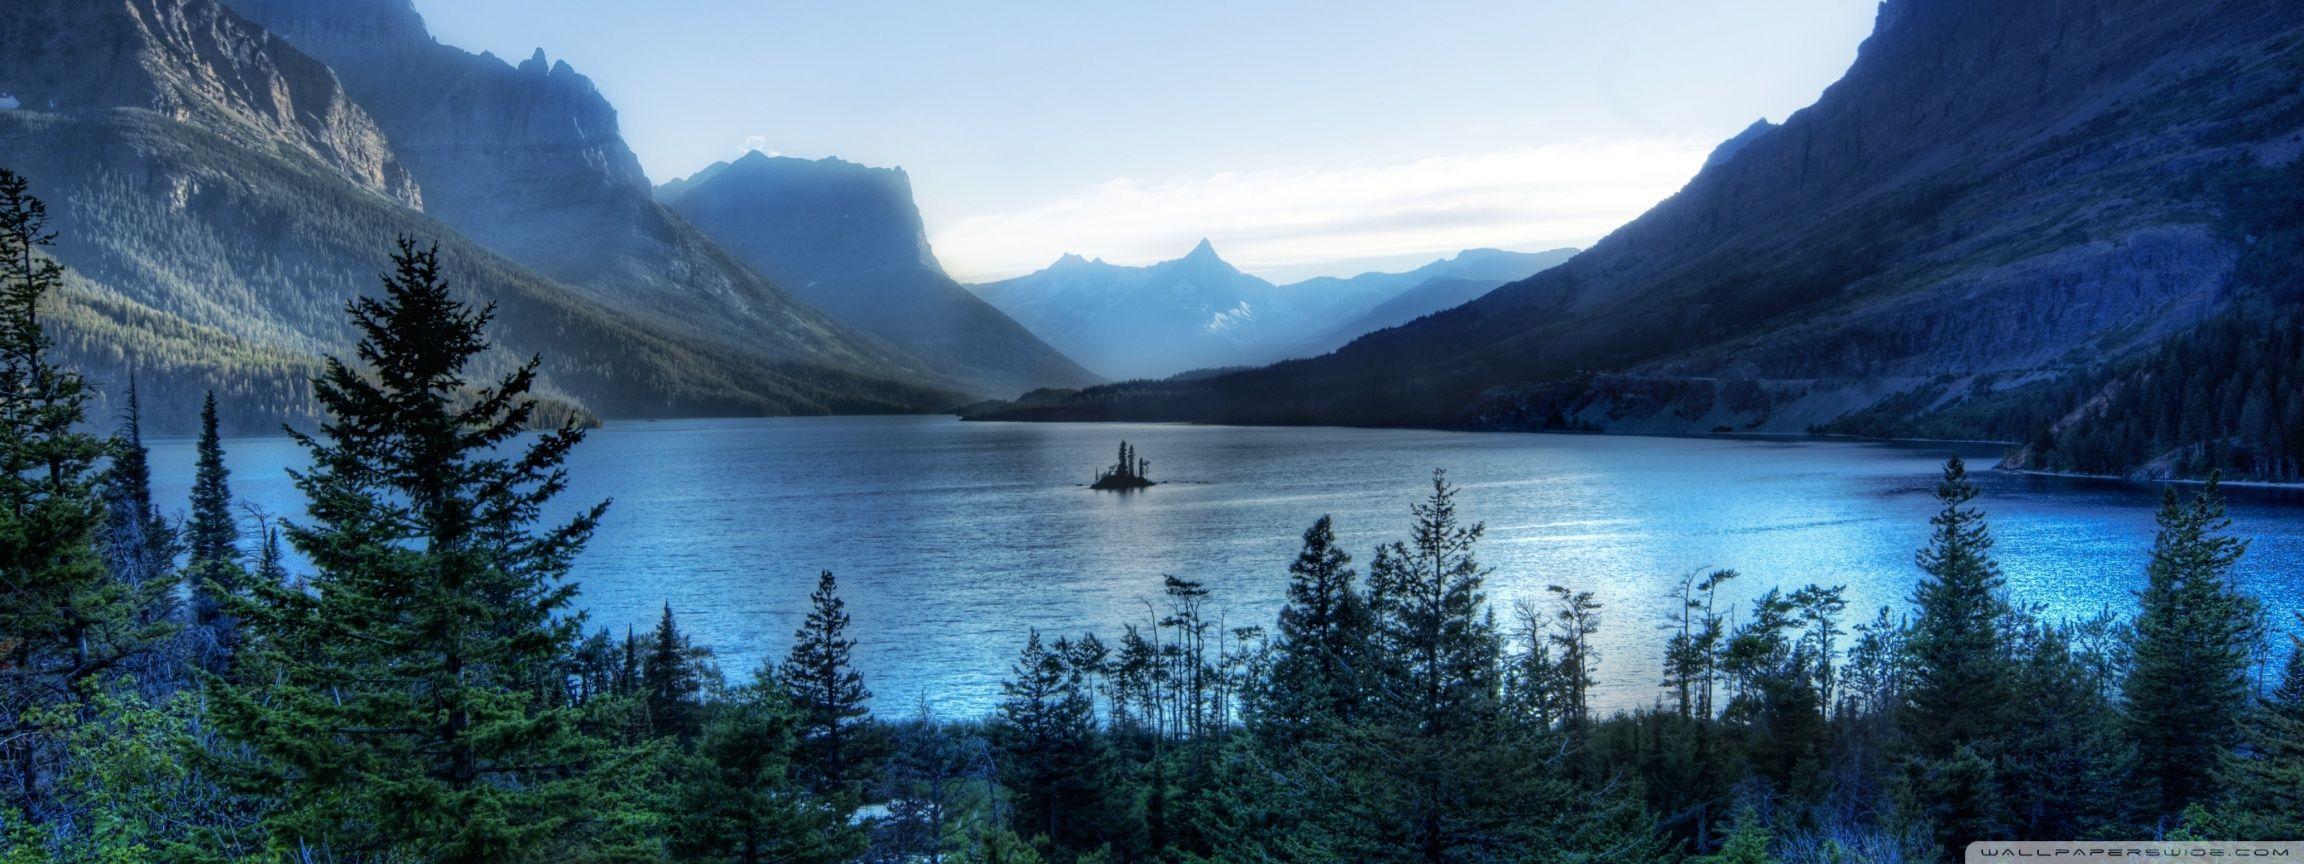 Glacier National Park Dual Monitor Hdpicorner National Parks Lake Landscape Glacier National Park